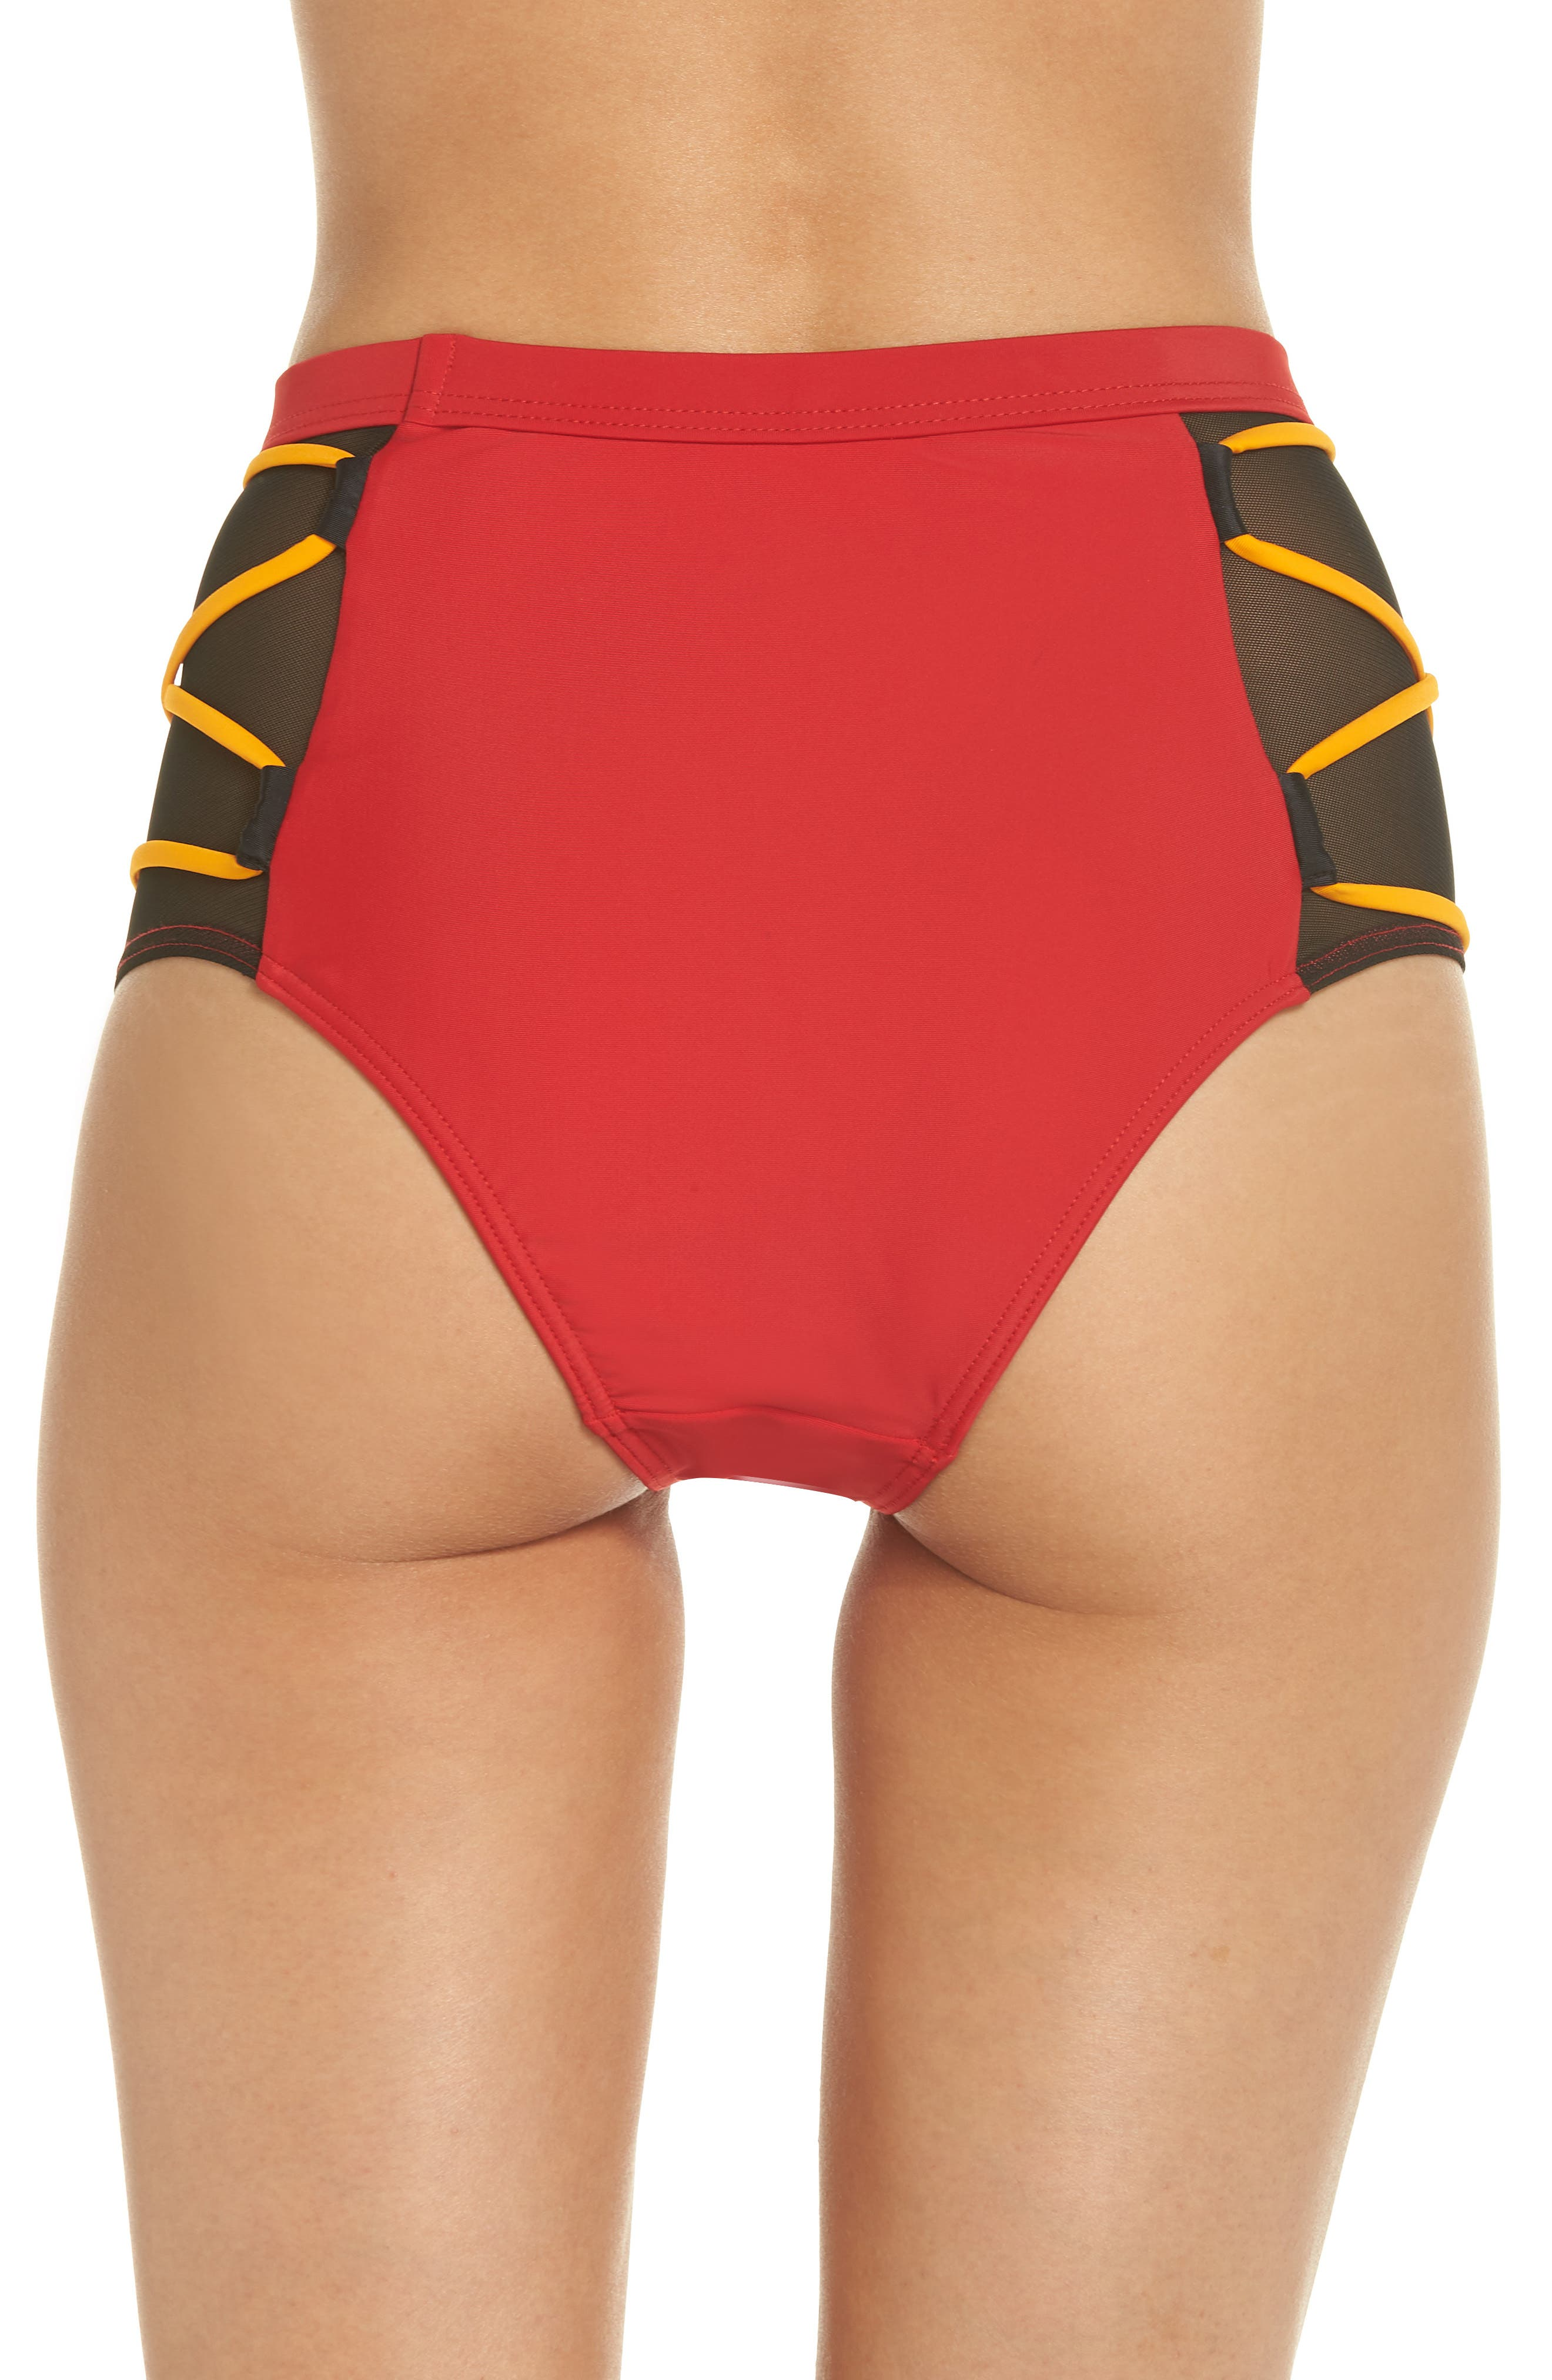 Launch Bikini Bottoms,                             Alternate thumbnail 2, color,                             Red/ Black/ Orange